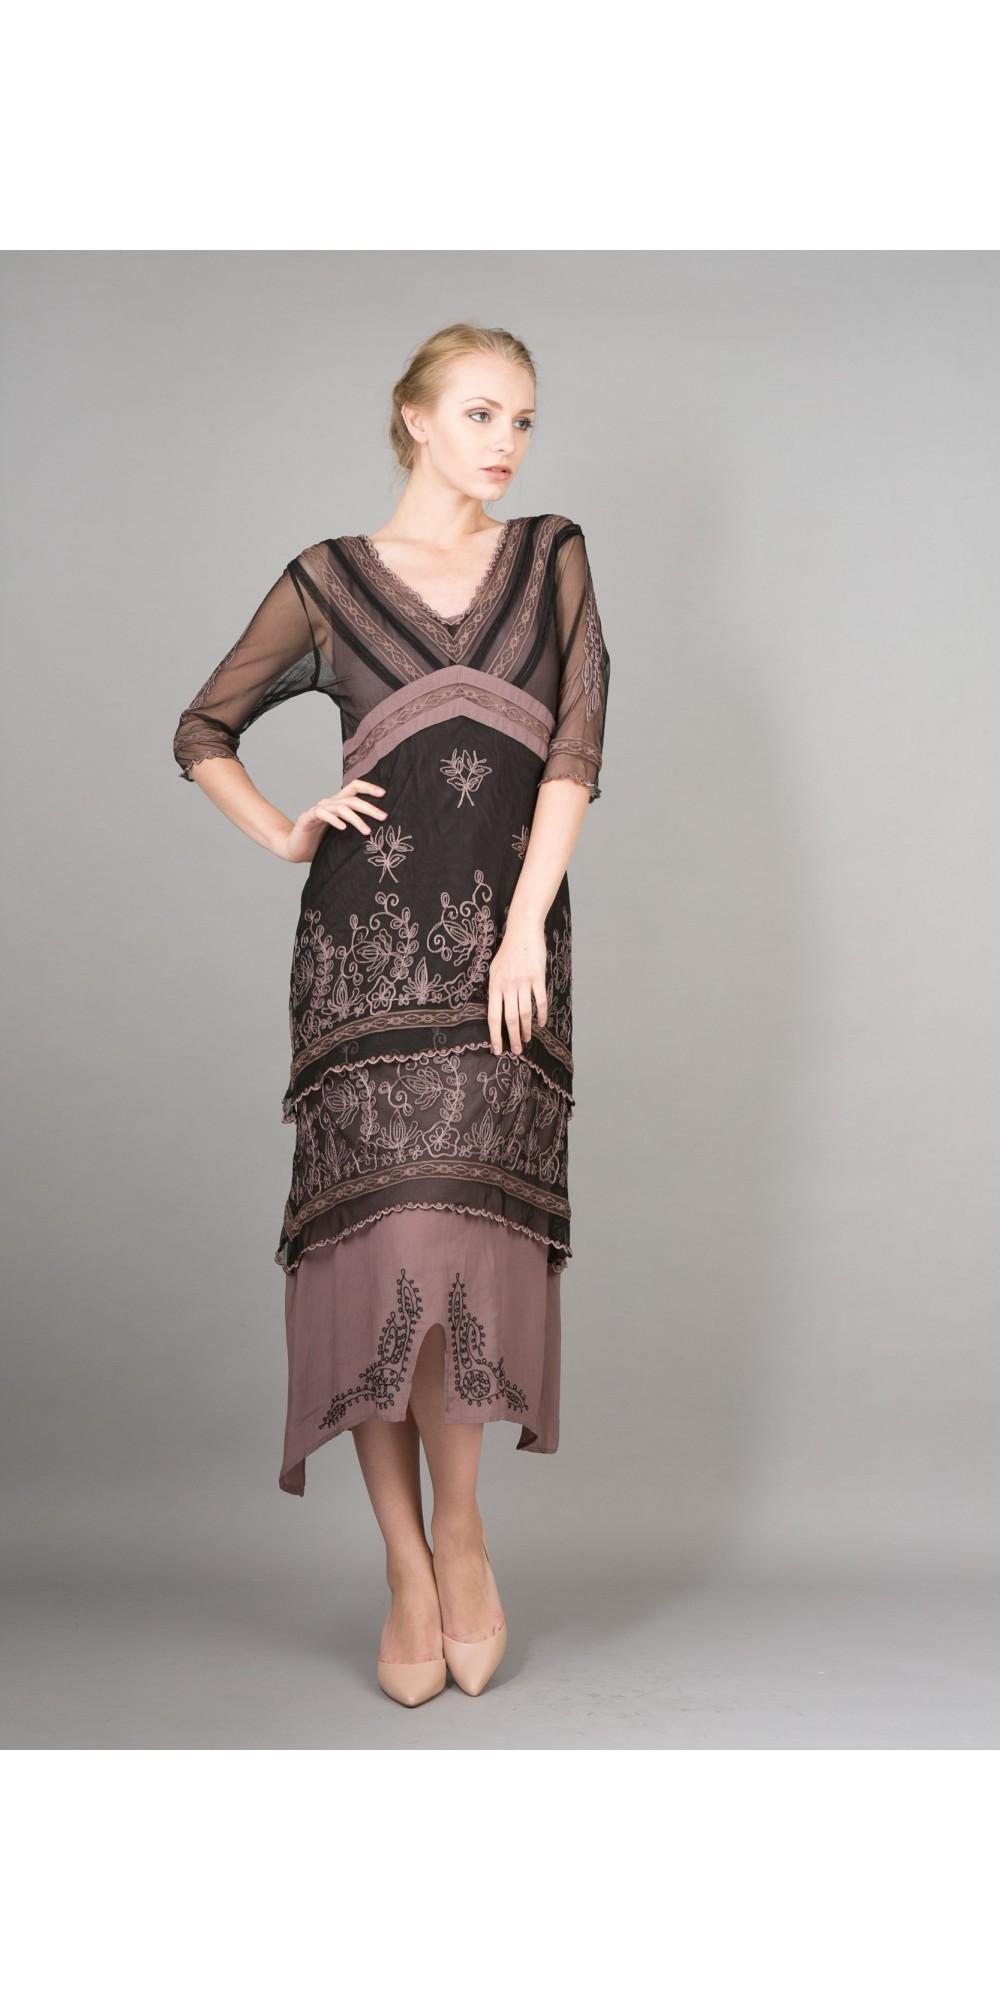 Nataya Titanic Dress 5901 Vintage Inspired Wedding Dress